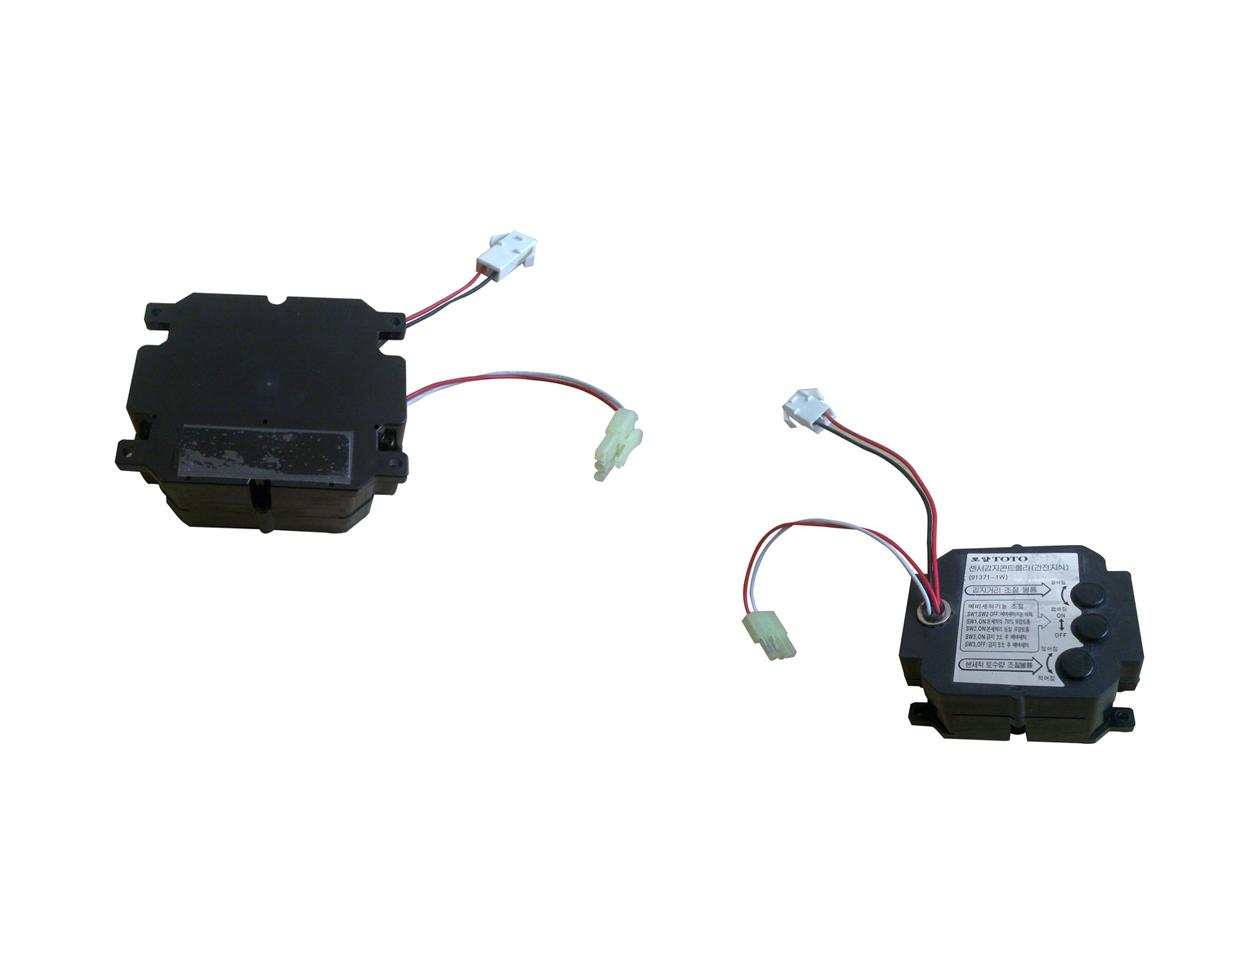 R-TOTO 雷竞技app下载电路 (正方形面板适用)